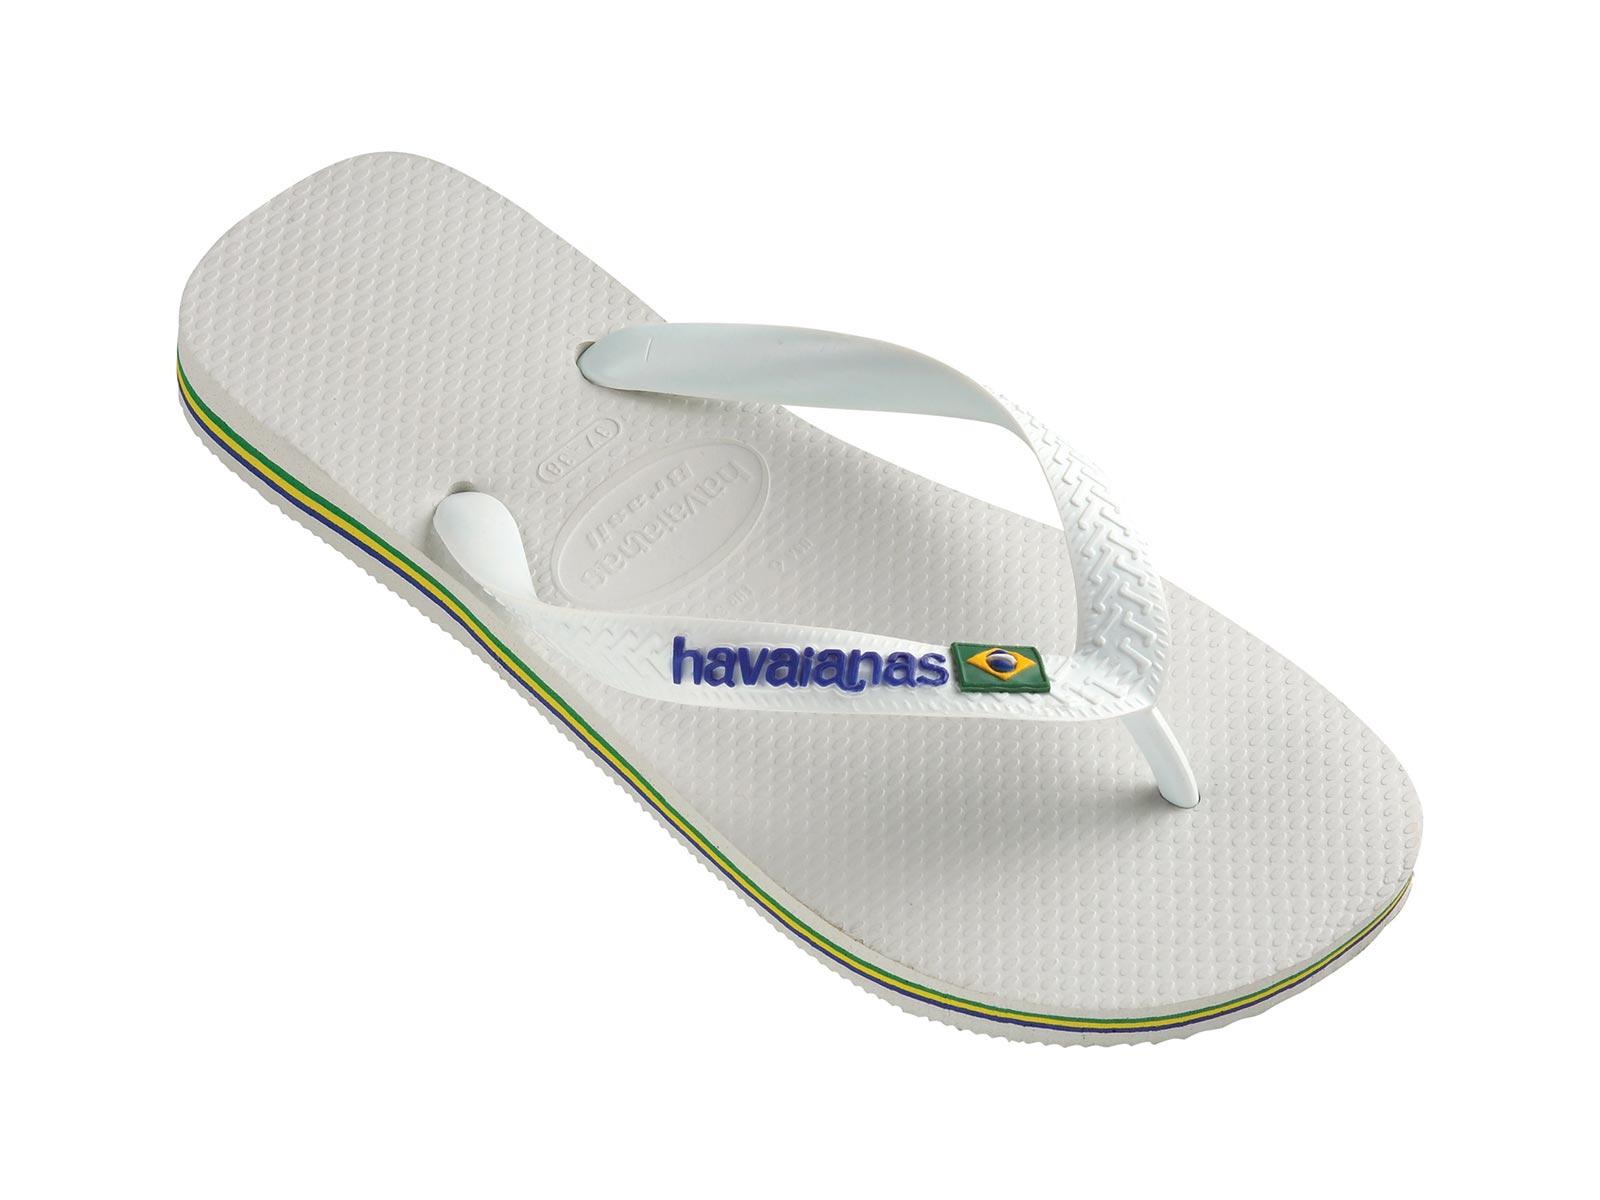 70f10882a Flip-Flops Flip-flops - Brasil Logo White - Brand Havaianas